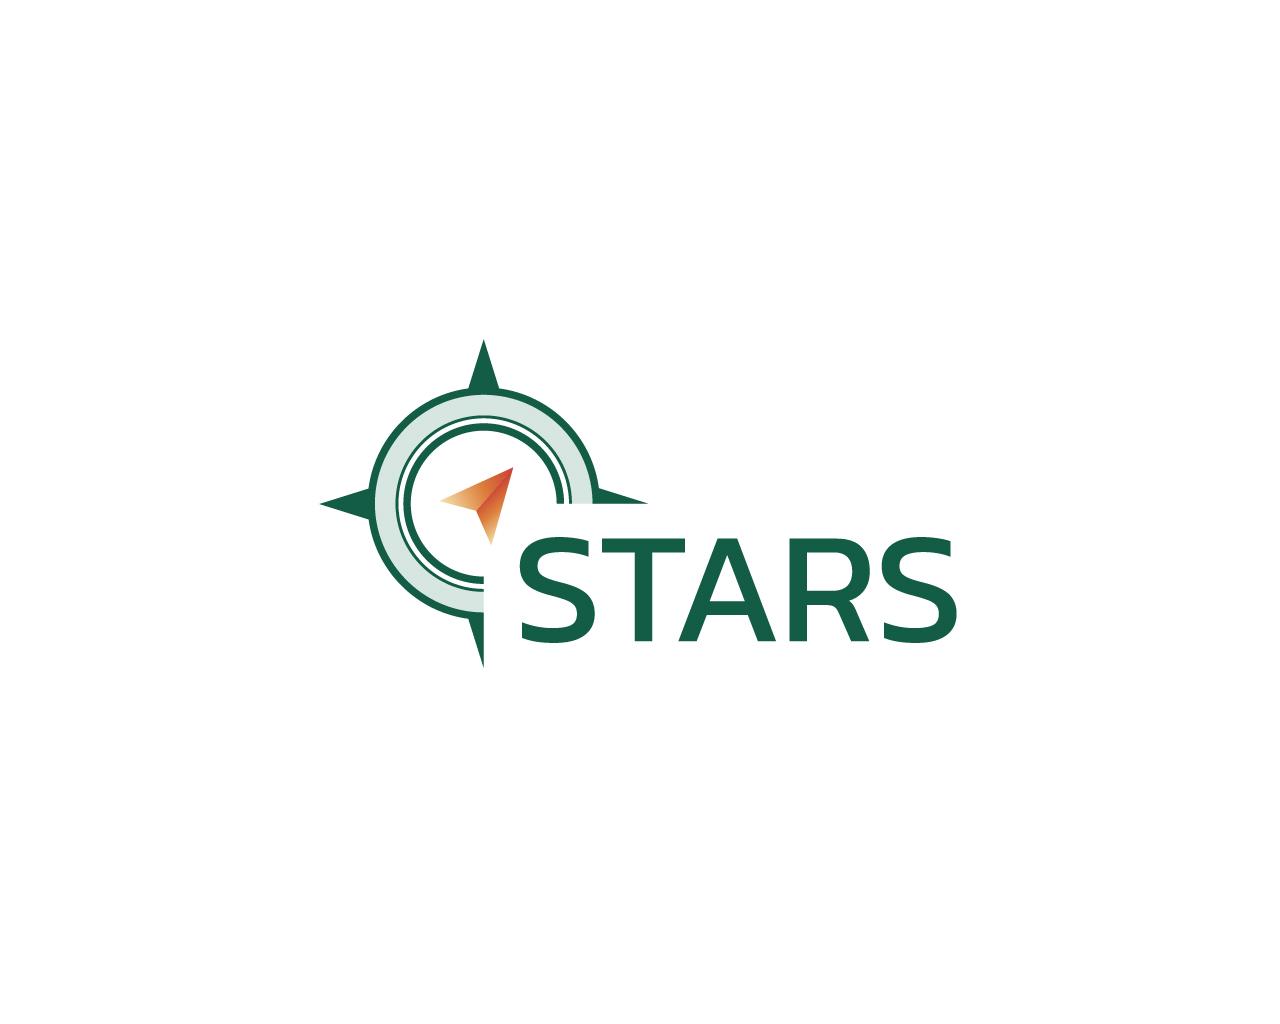 New Logo for STARS Subbrand